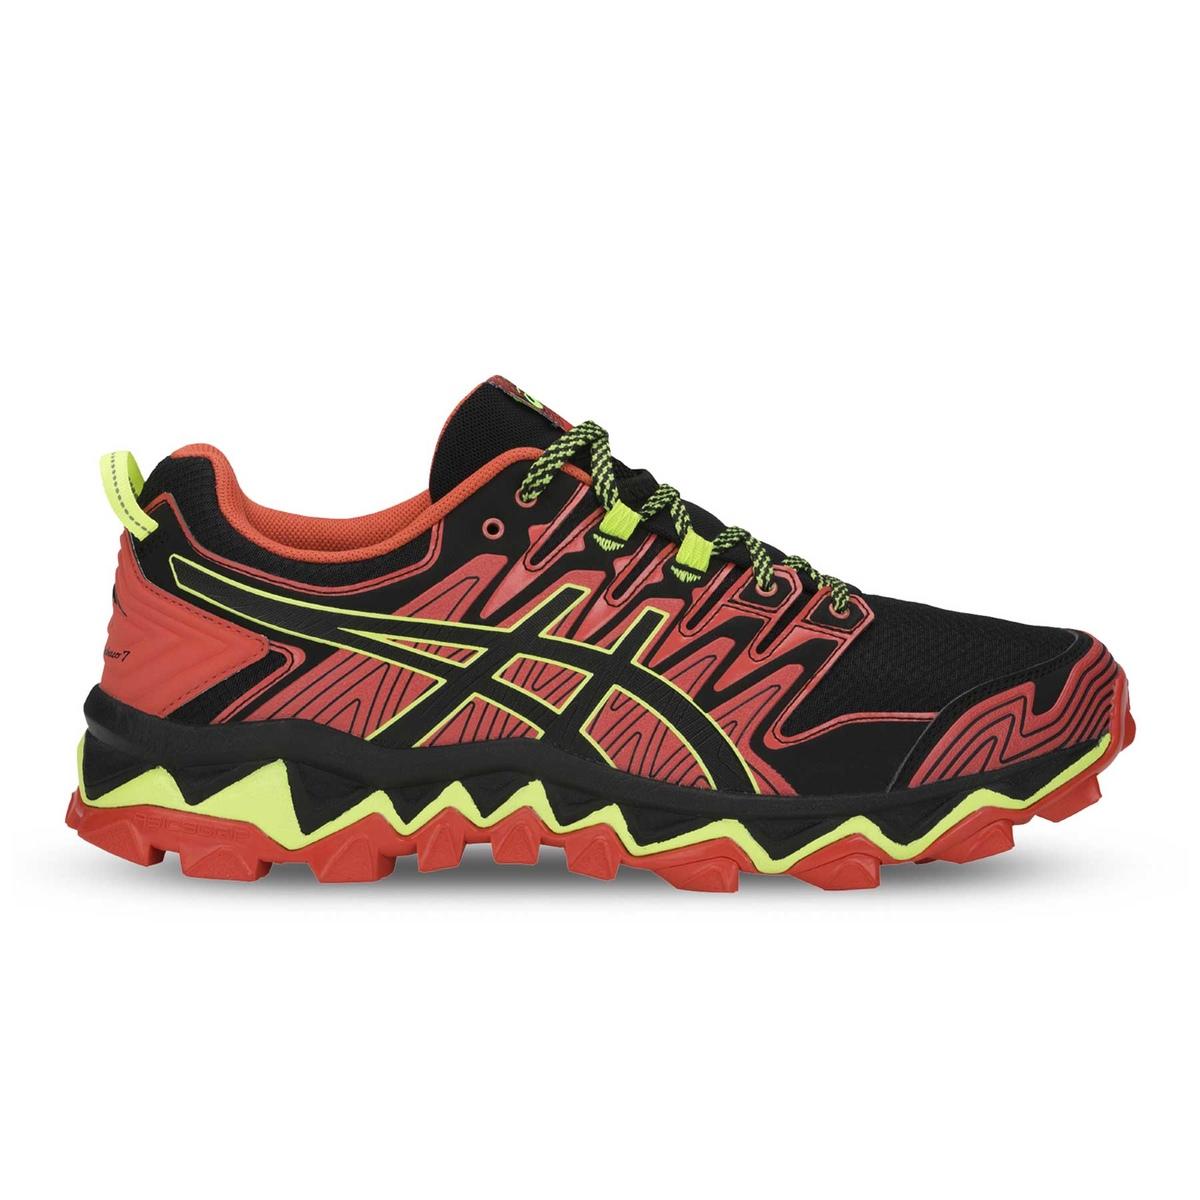 Scarpe 7 Fujitrabuco Runnea Running Caratteristiche Asics Gel 4g0nAq48